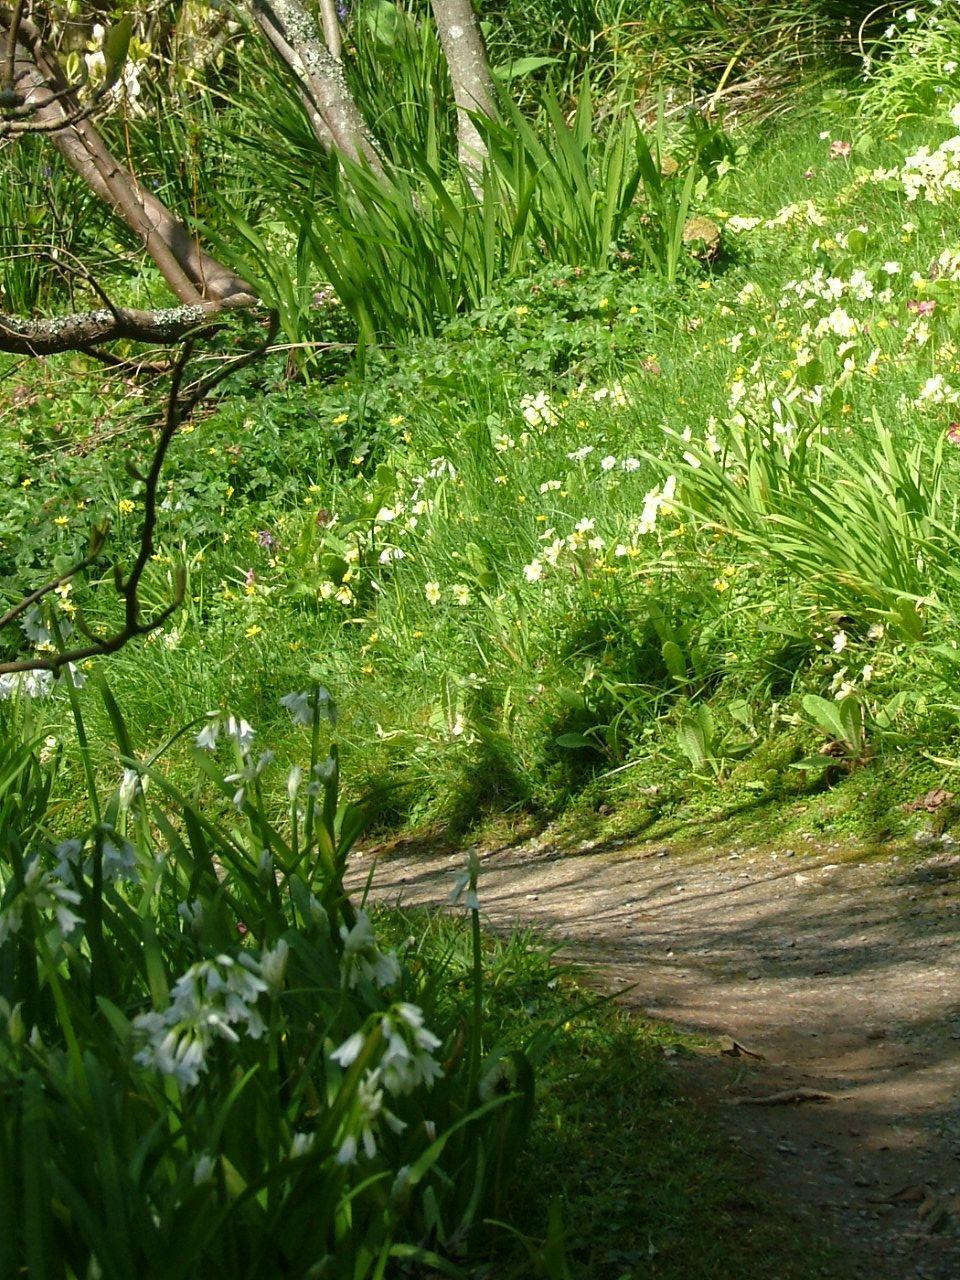 Wild garlic and primroses at NT Coleton Fishacre, Devon